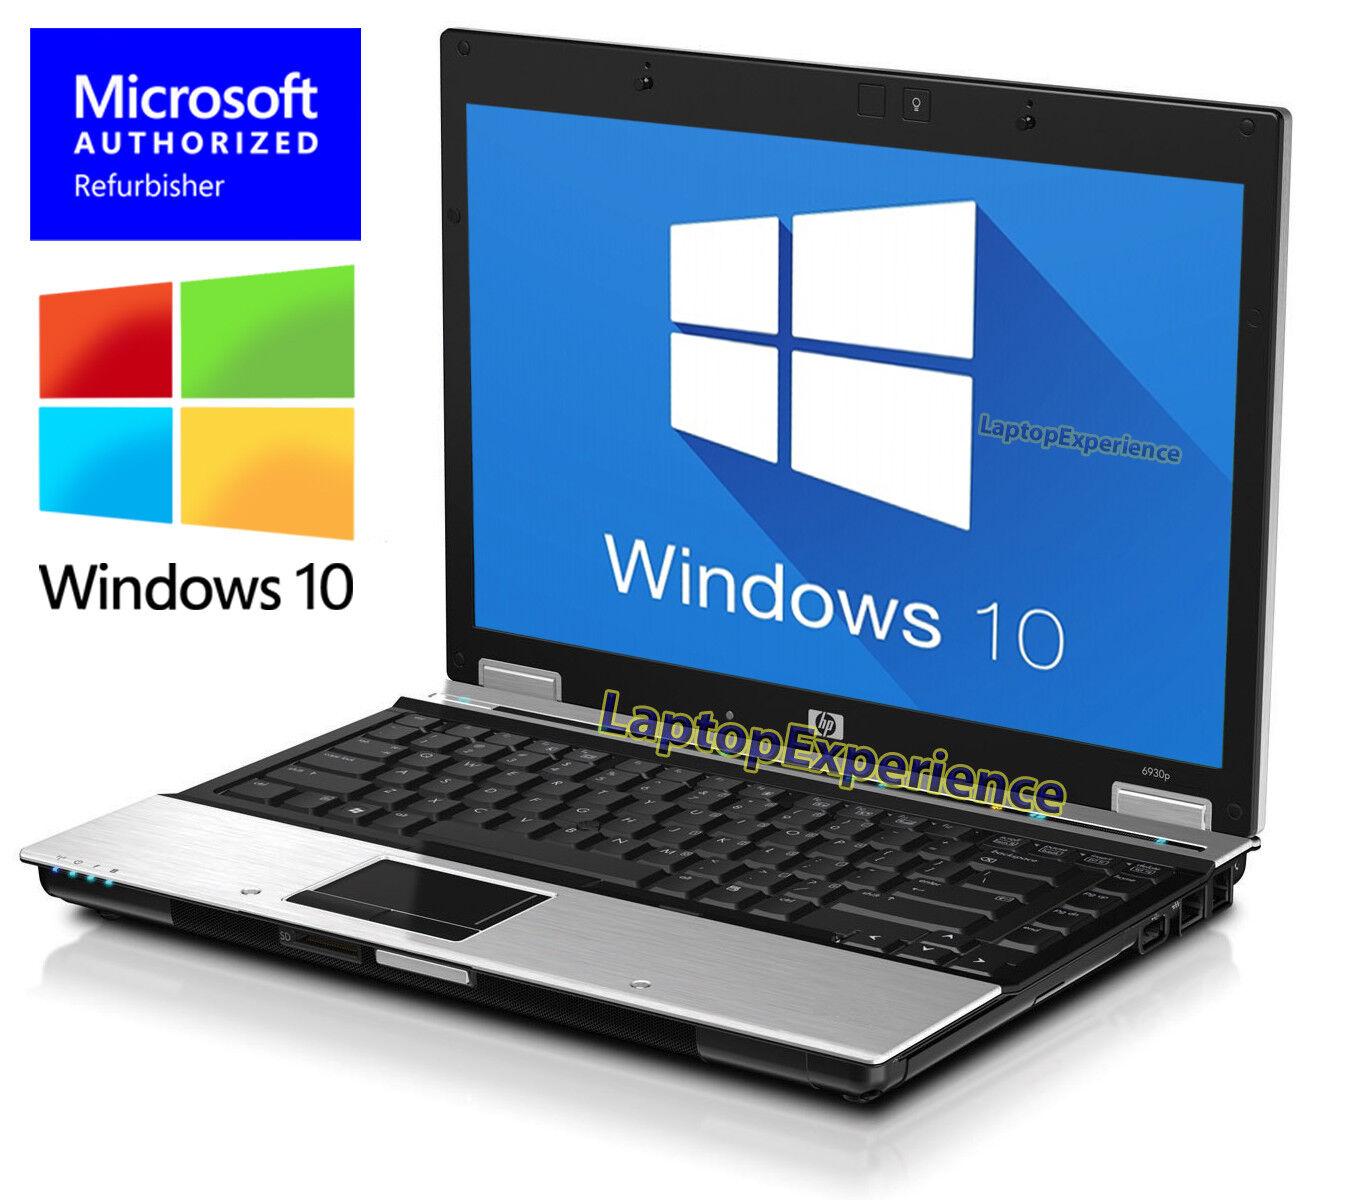 "HP Elitebook 6930p LAPTOP C2D 2.40ghz 14.1"" 160GB HD DVD WINDOWS 10  NOTEBOOK PC"